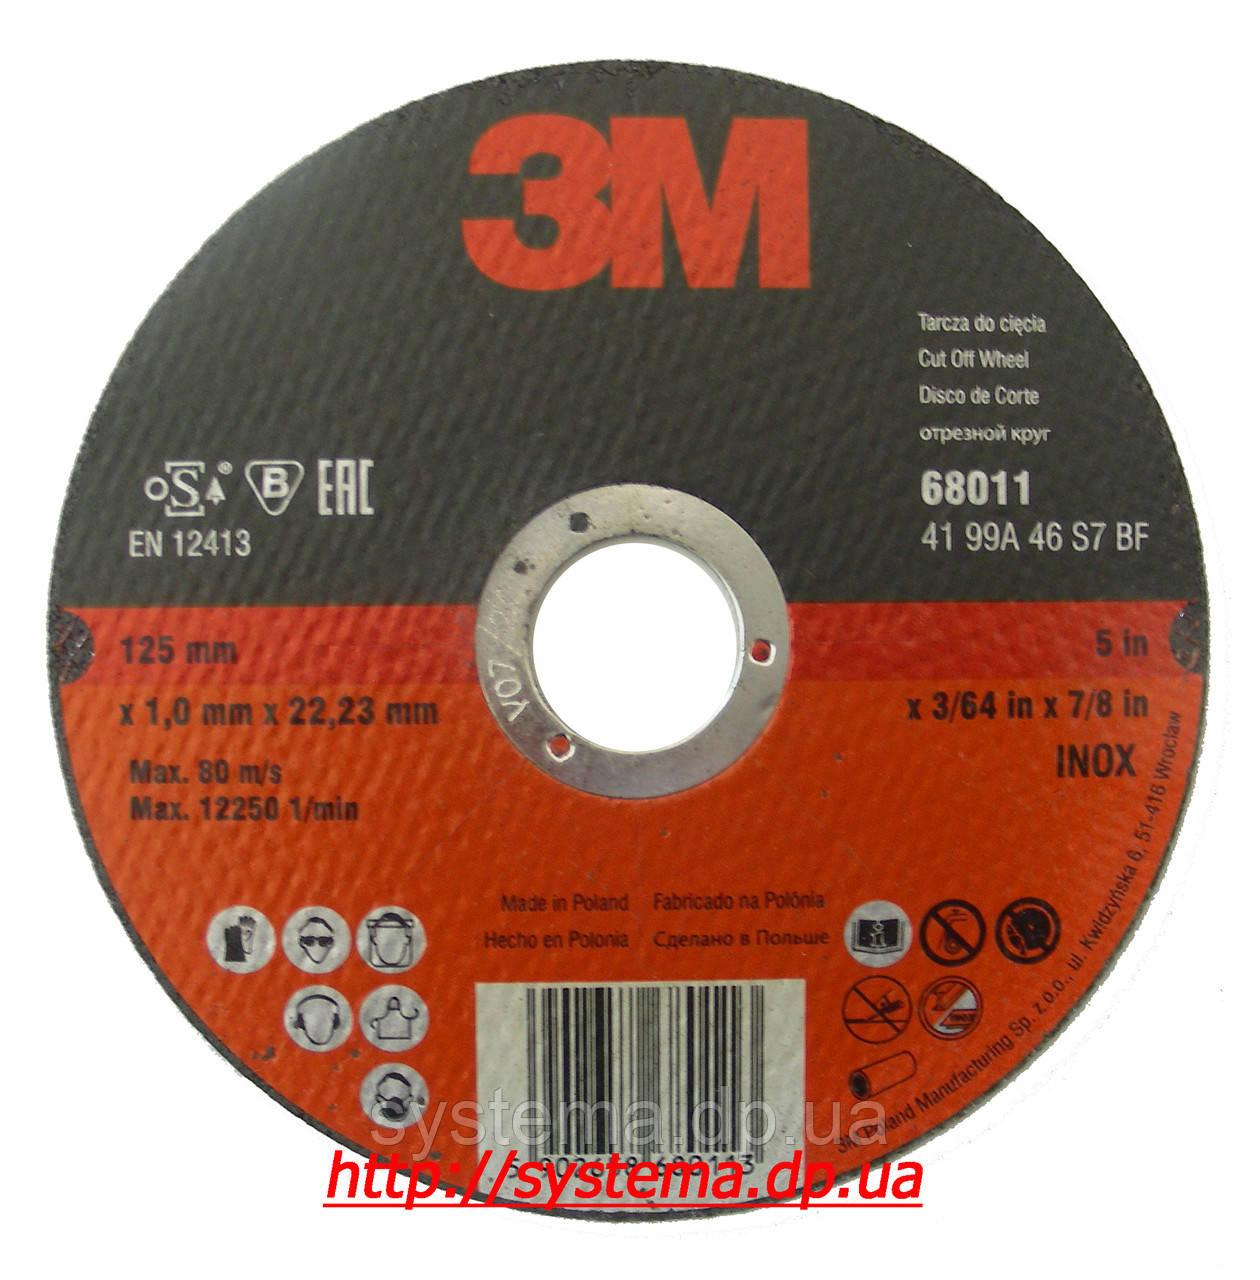 3M™ 63984 - Зачистной диск T27 INOX, по нержавеющей стали, 125х22,23х6,8 мм